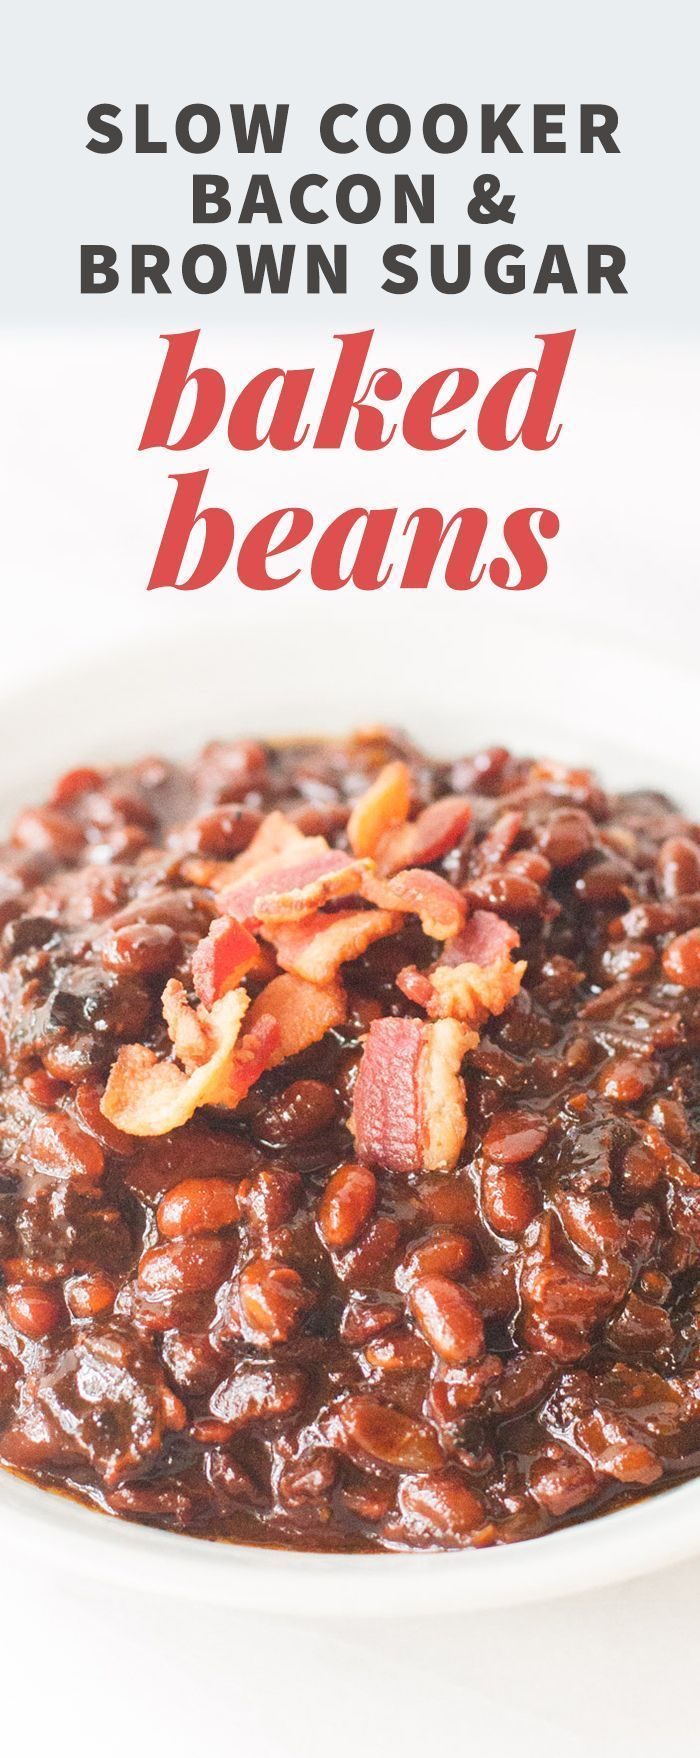 Slow Cooker Bacon & Brown Sugar Baked Beans (Sponsored Partnership) #CrockPotRecipes #sponsored @Crockpot